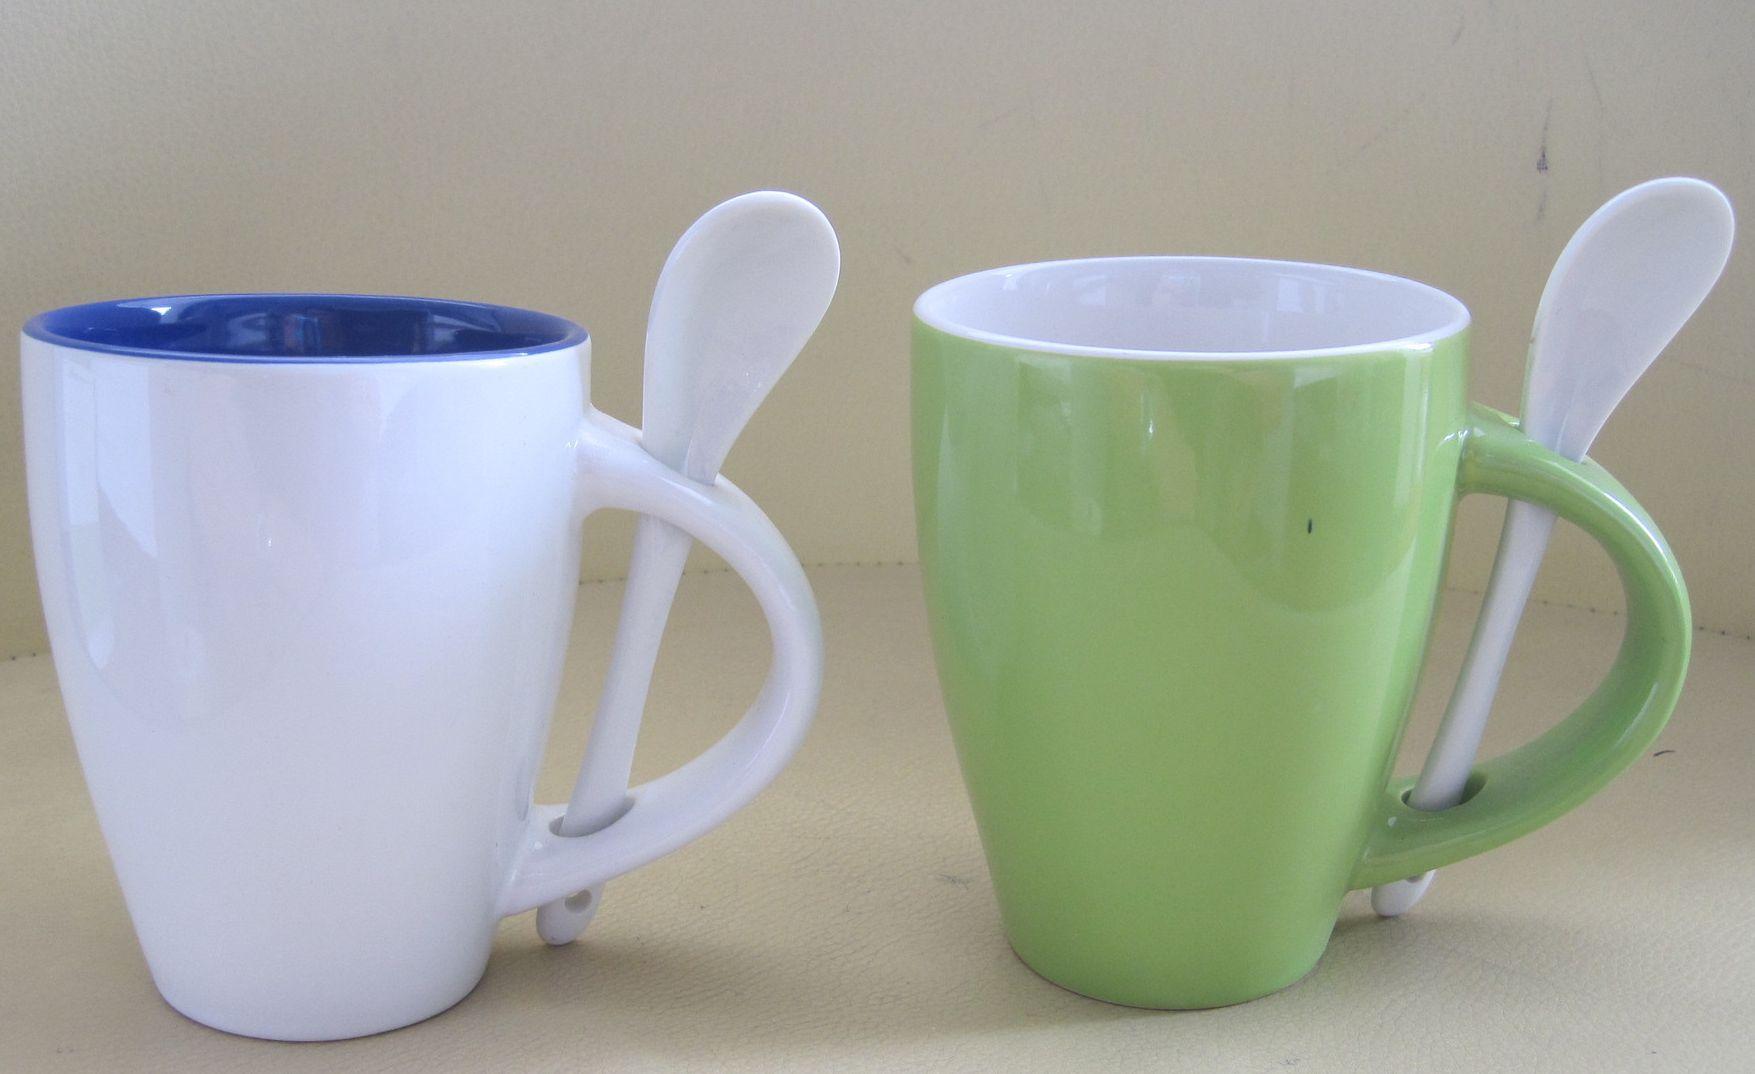 promotional-mug-with-spoon.jpg